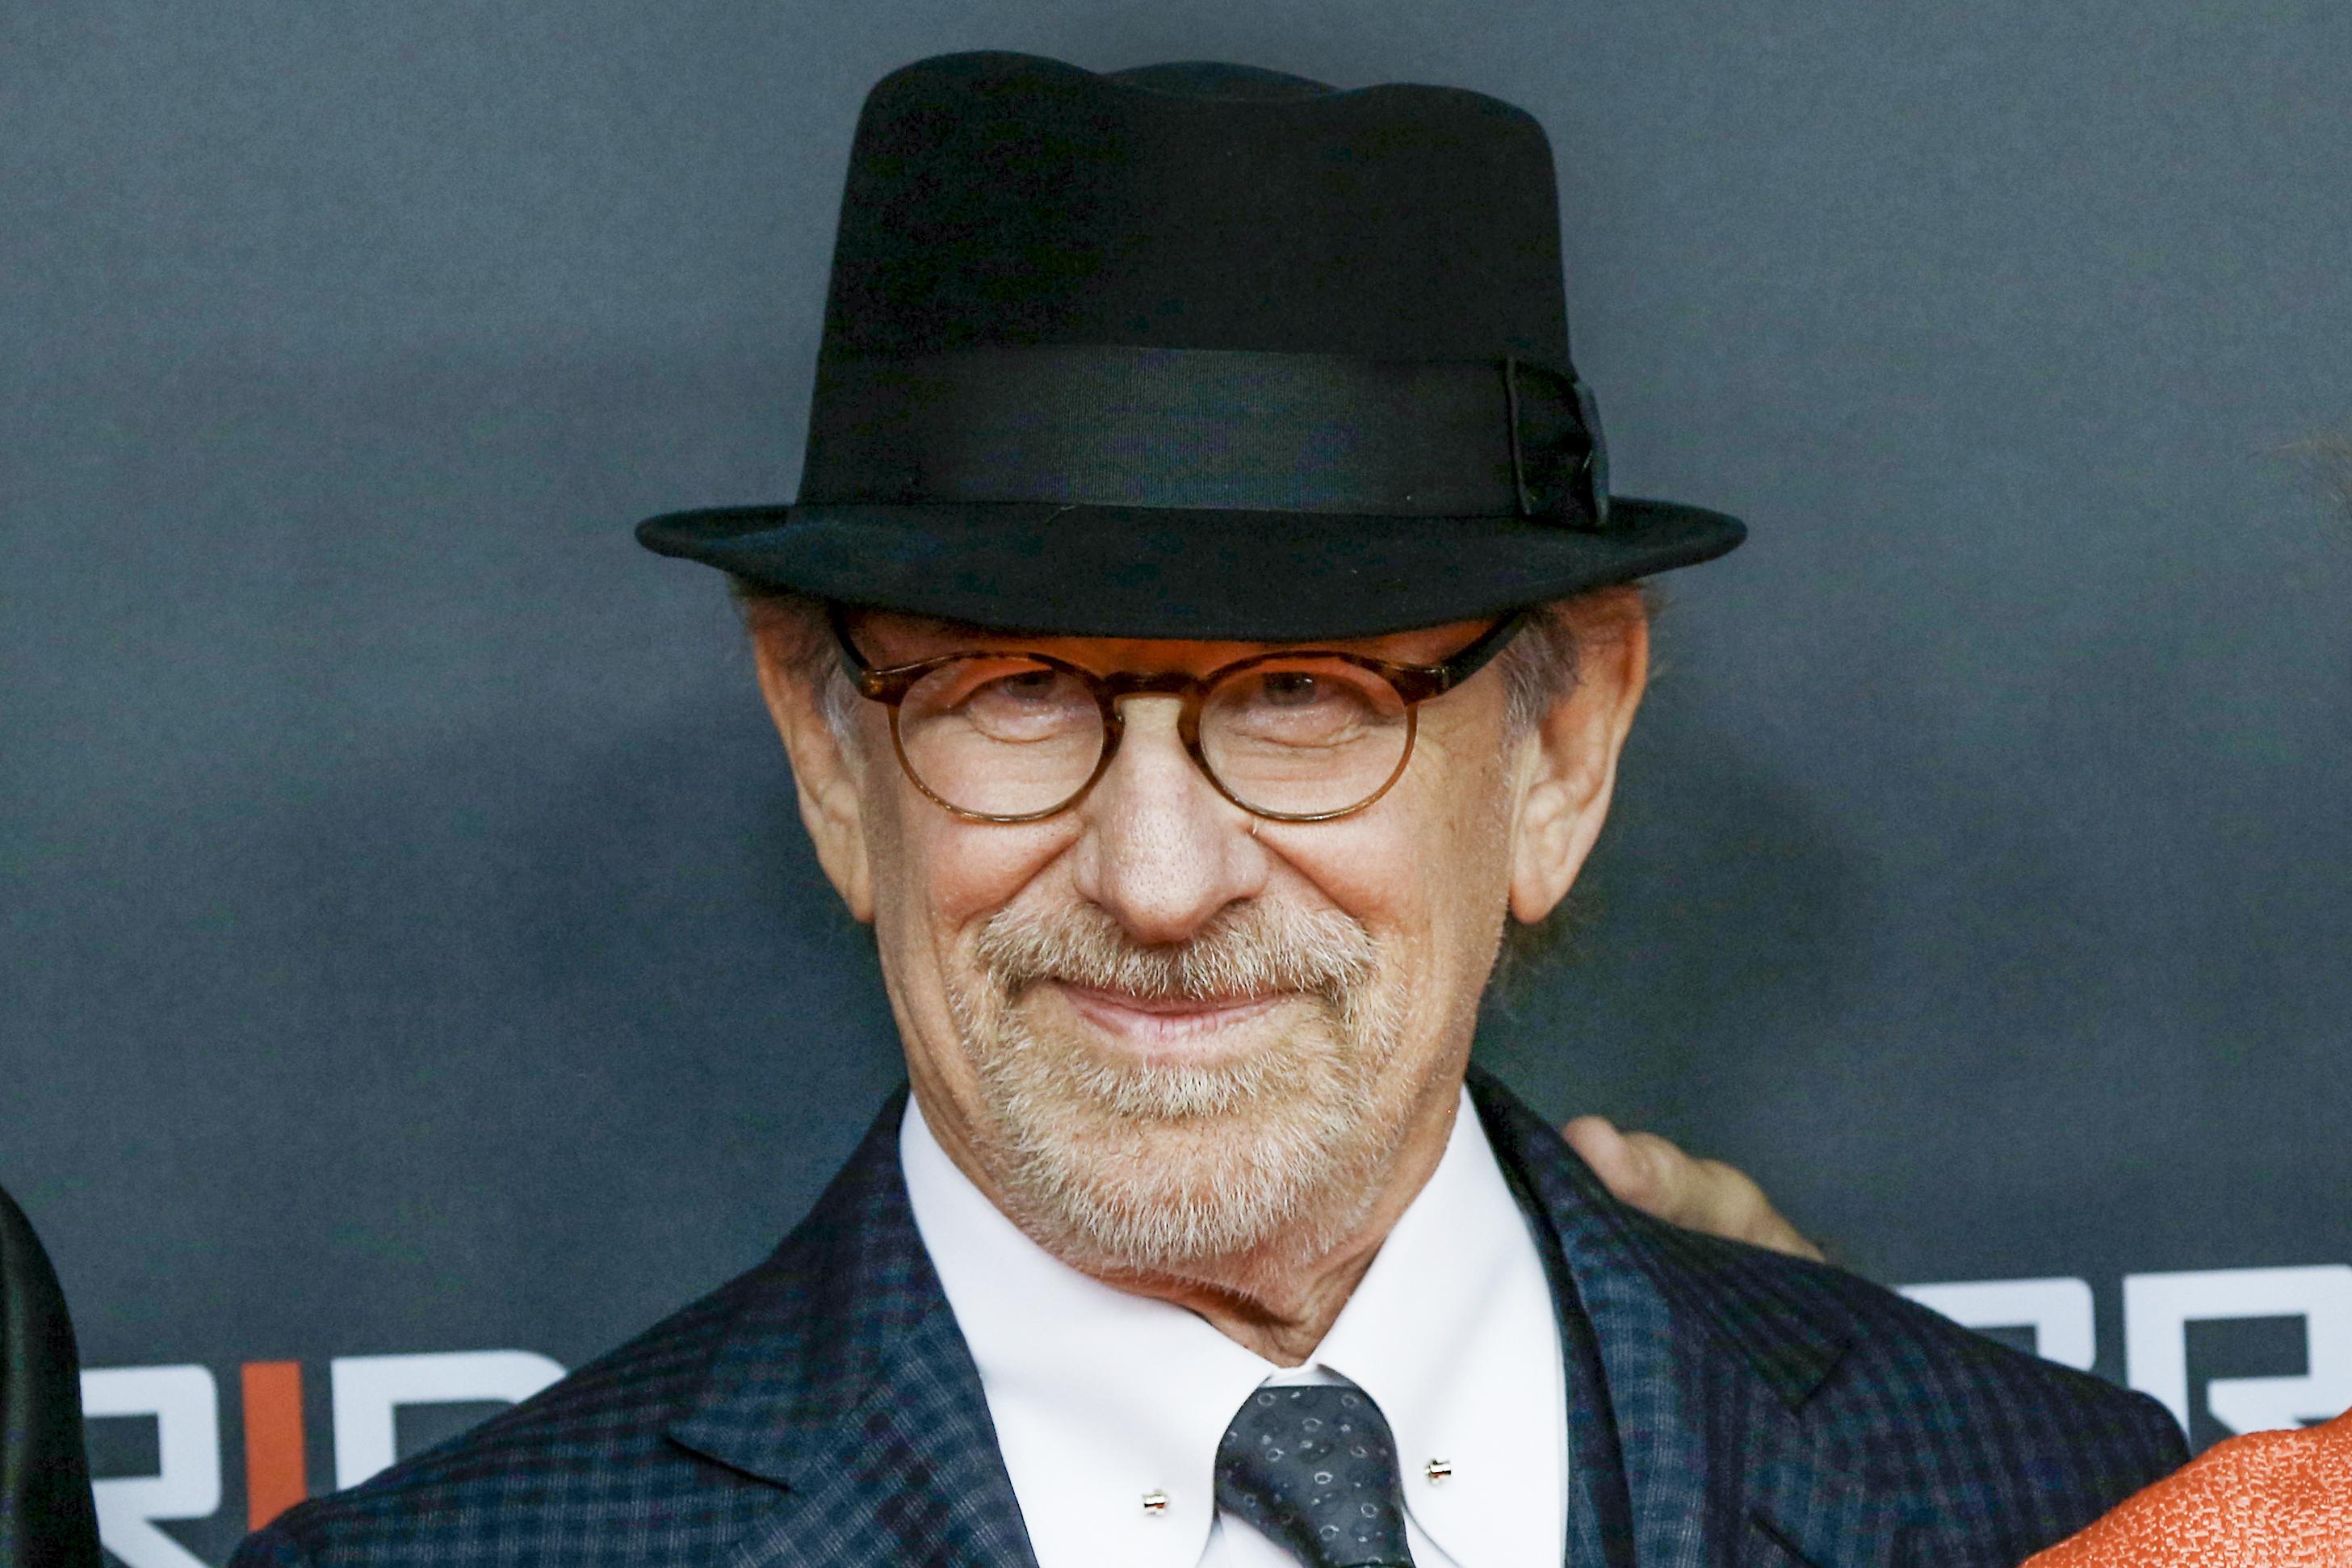 Steven Spielberg attends the 'Bridge of Spies - Der Unterhaendler' World Premiere In Berlin on November 13, 2015 in Berlin, Germany.